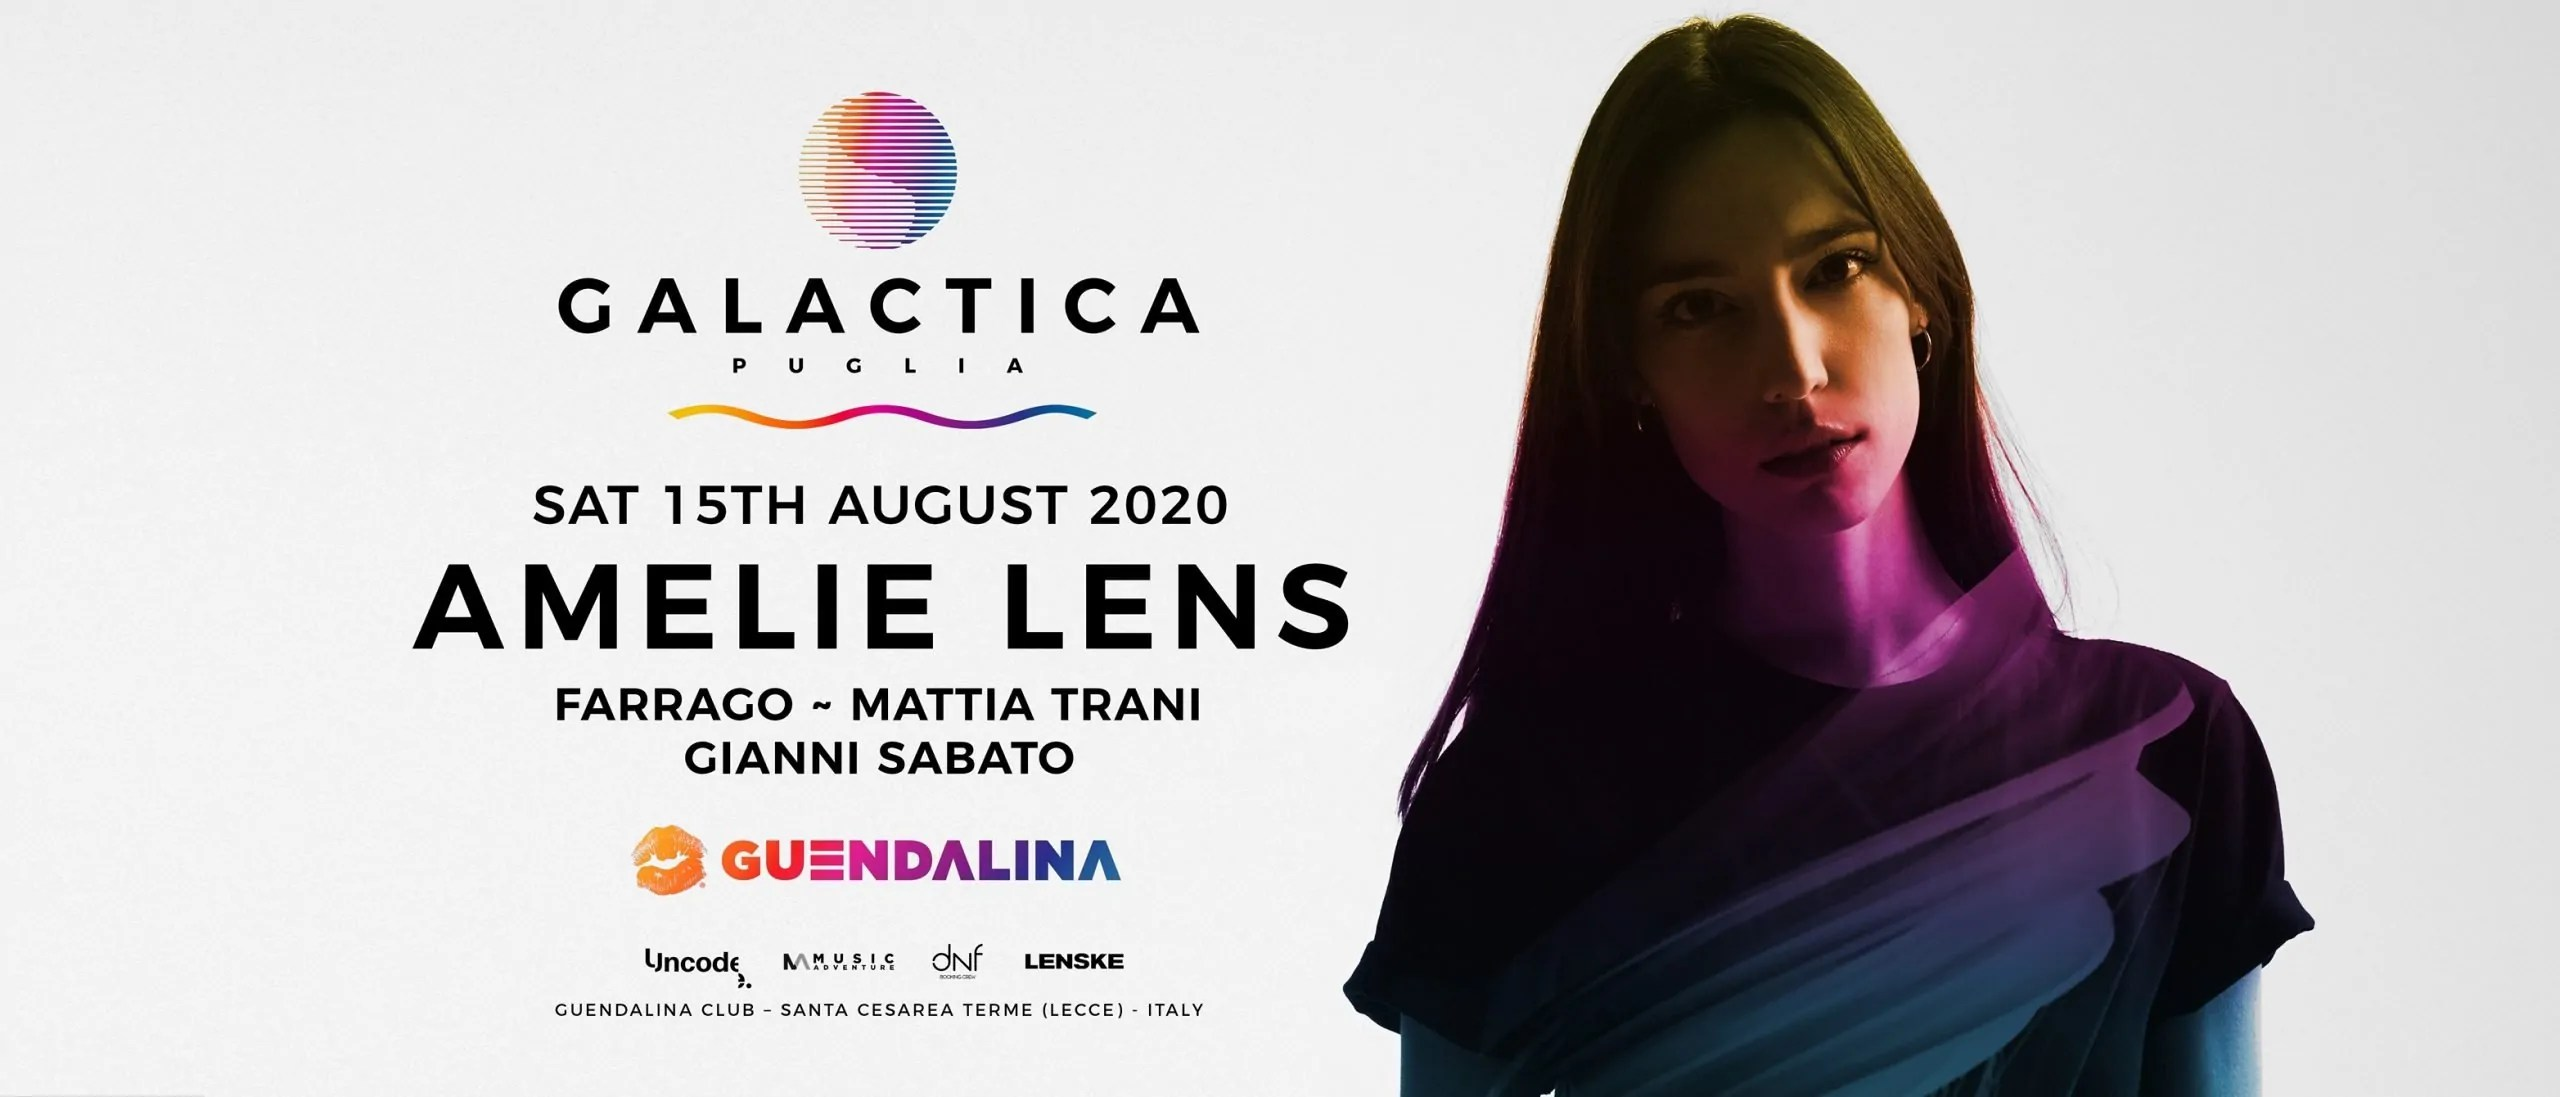 Amelie Lens Galactica Festival 2020